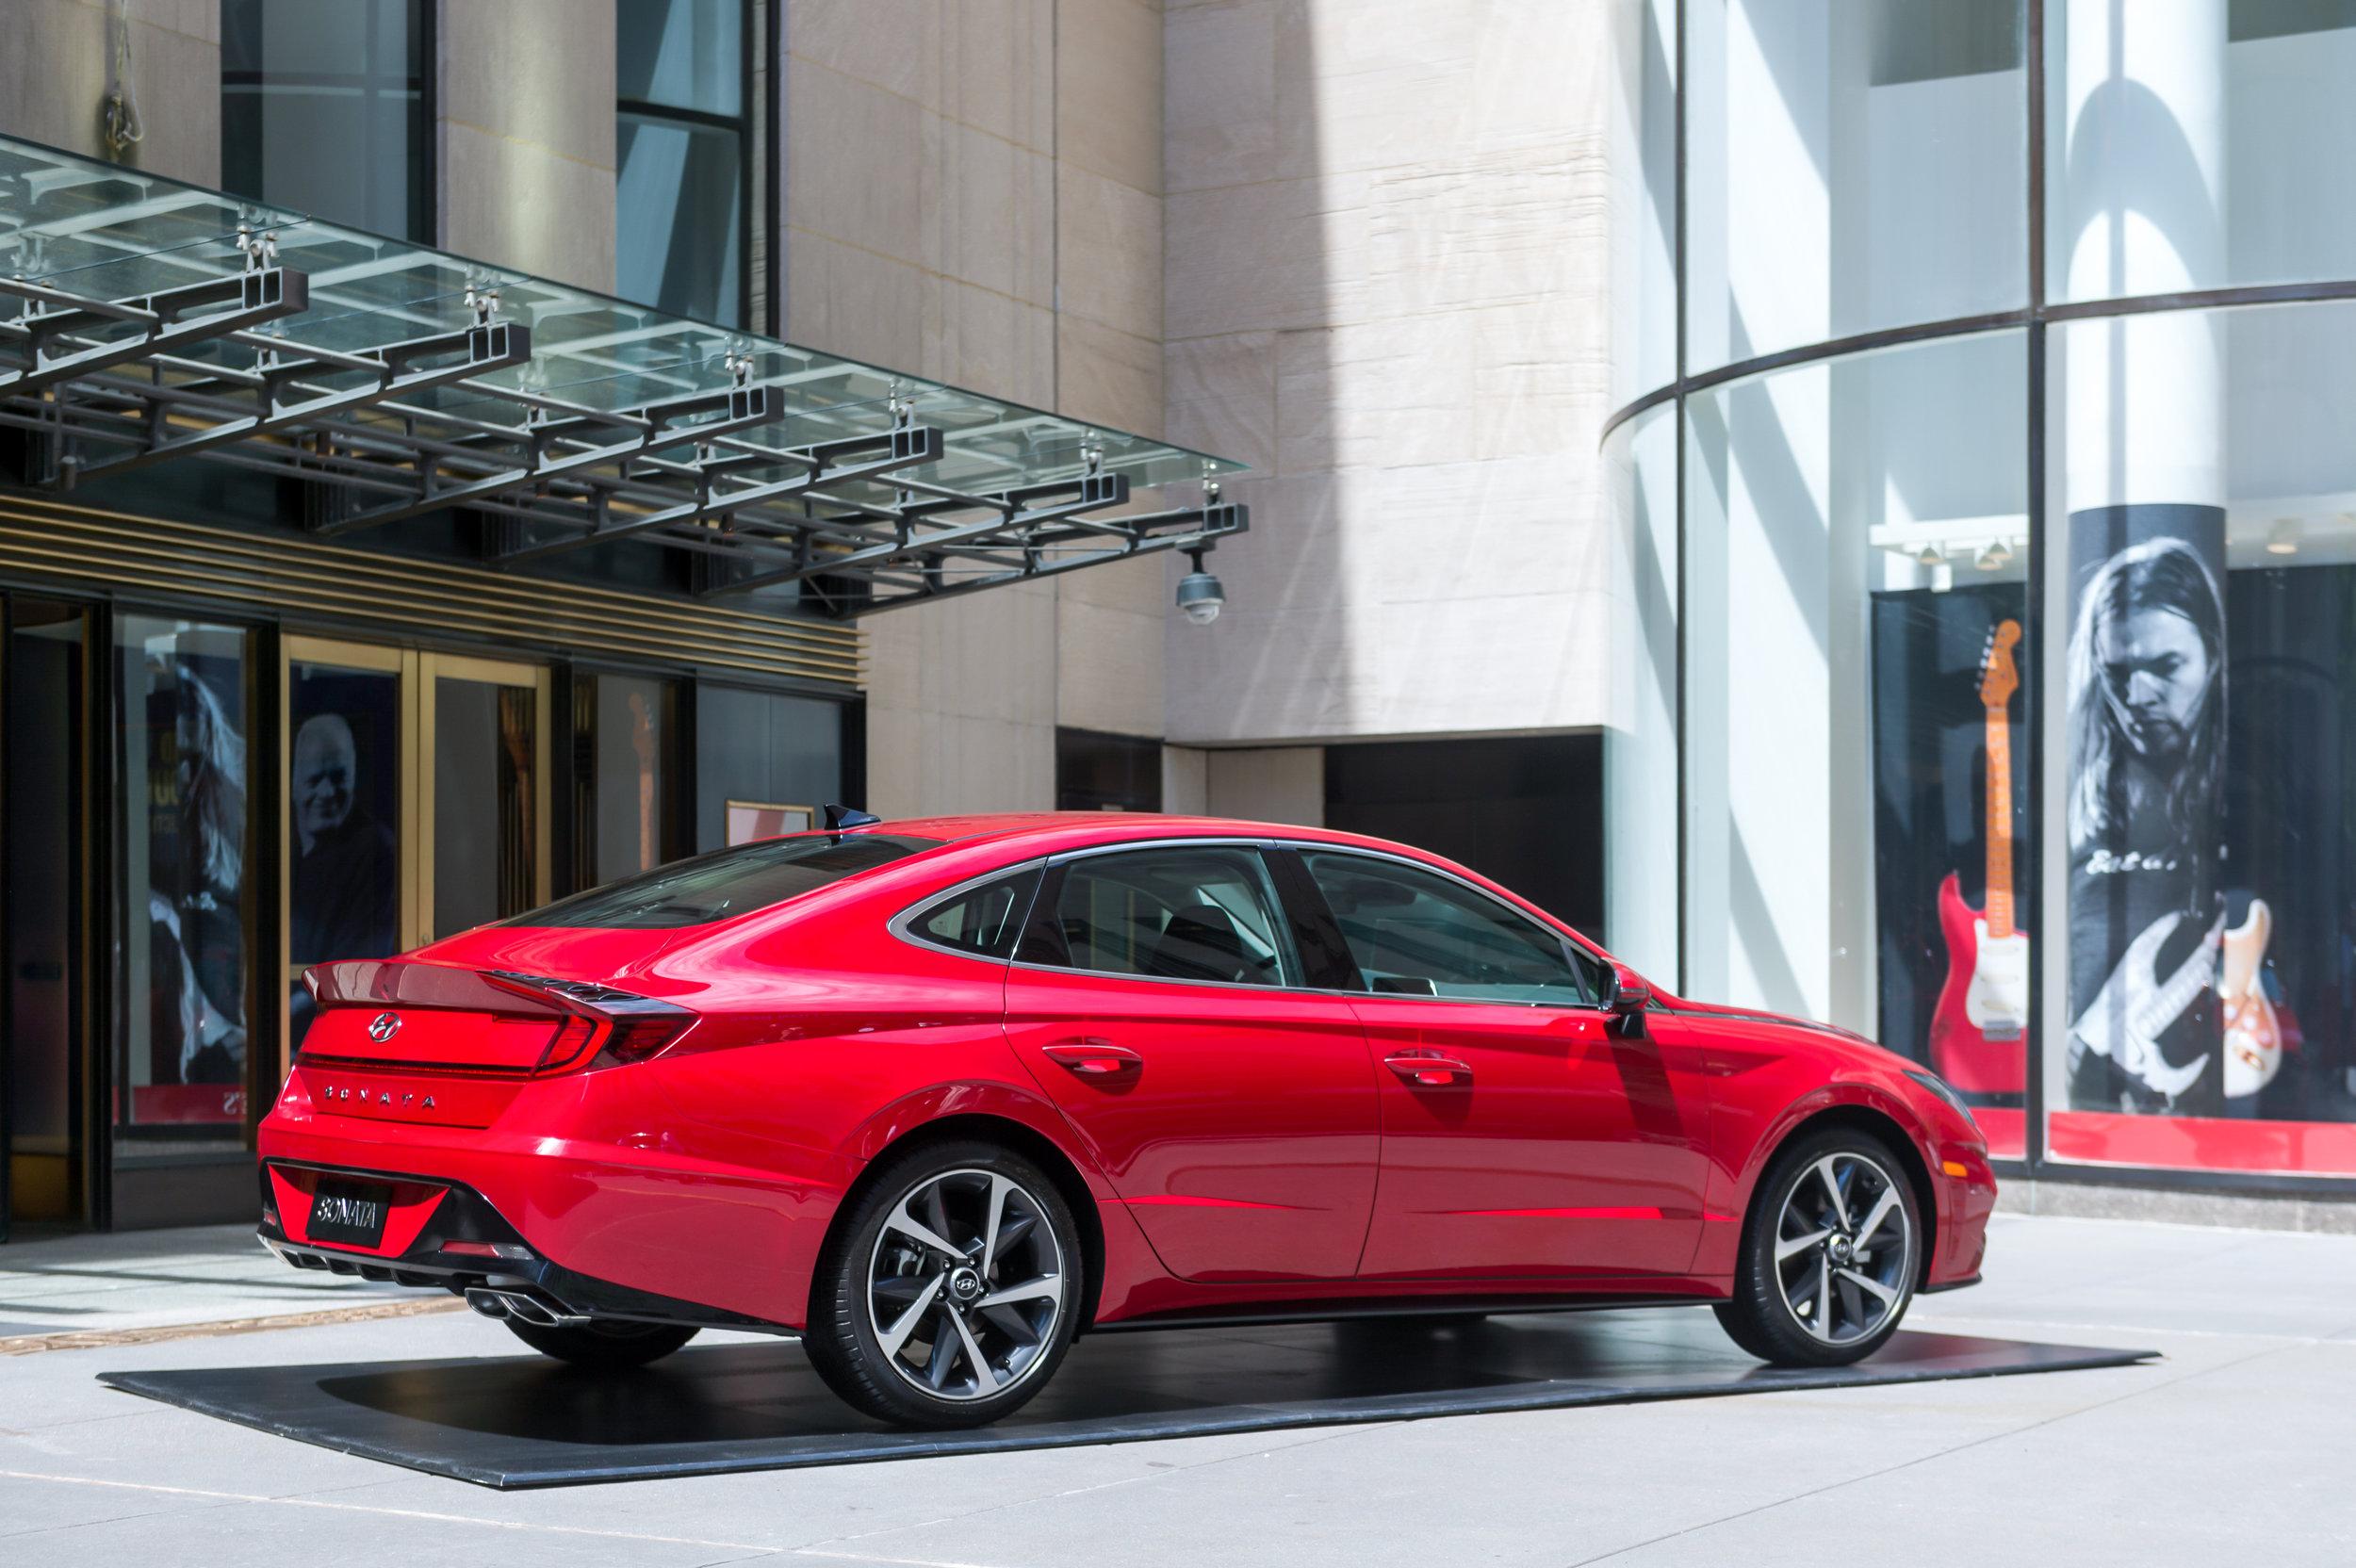 OHelloMedia-Hyundai-Christie'sAuctionHouse-TopSelect-8.jpg